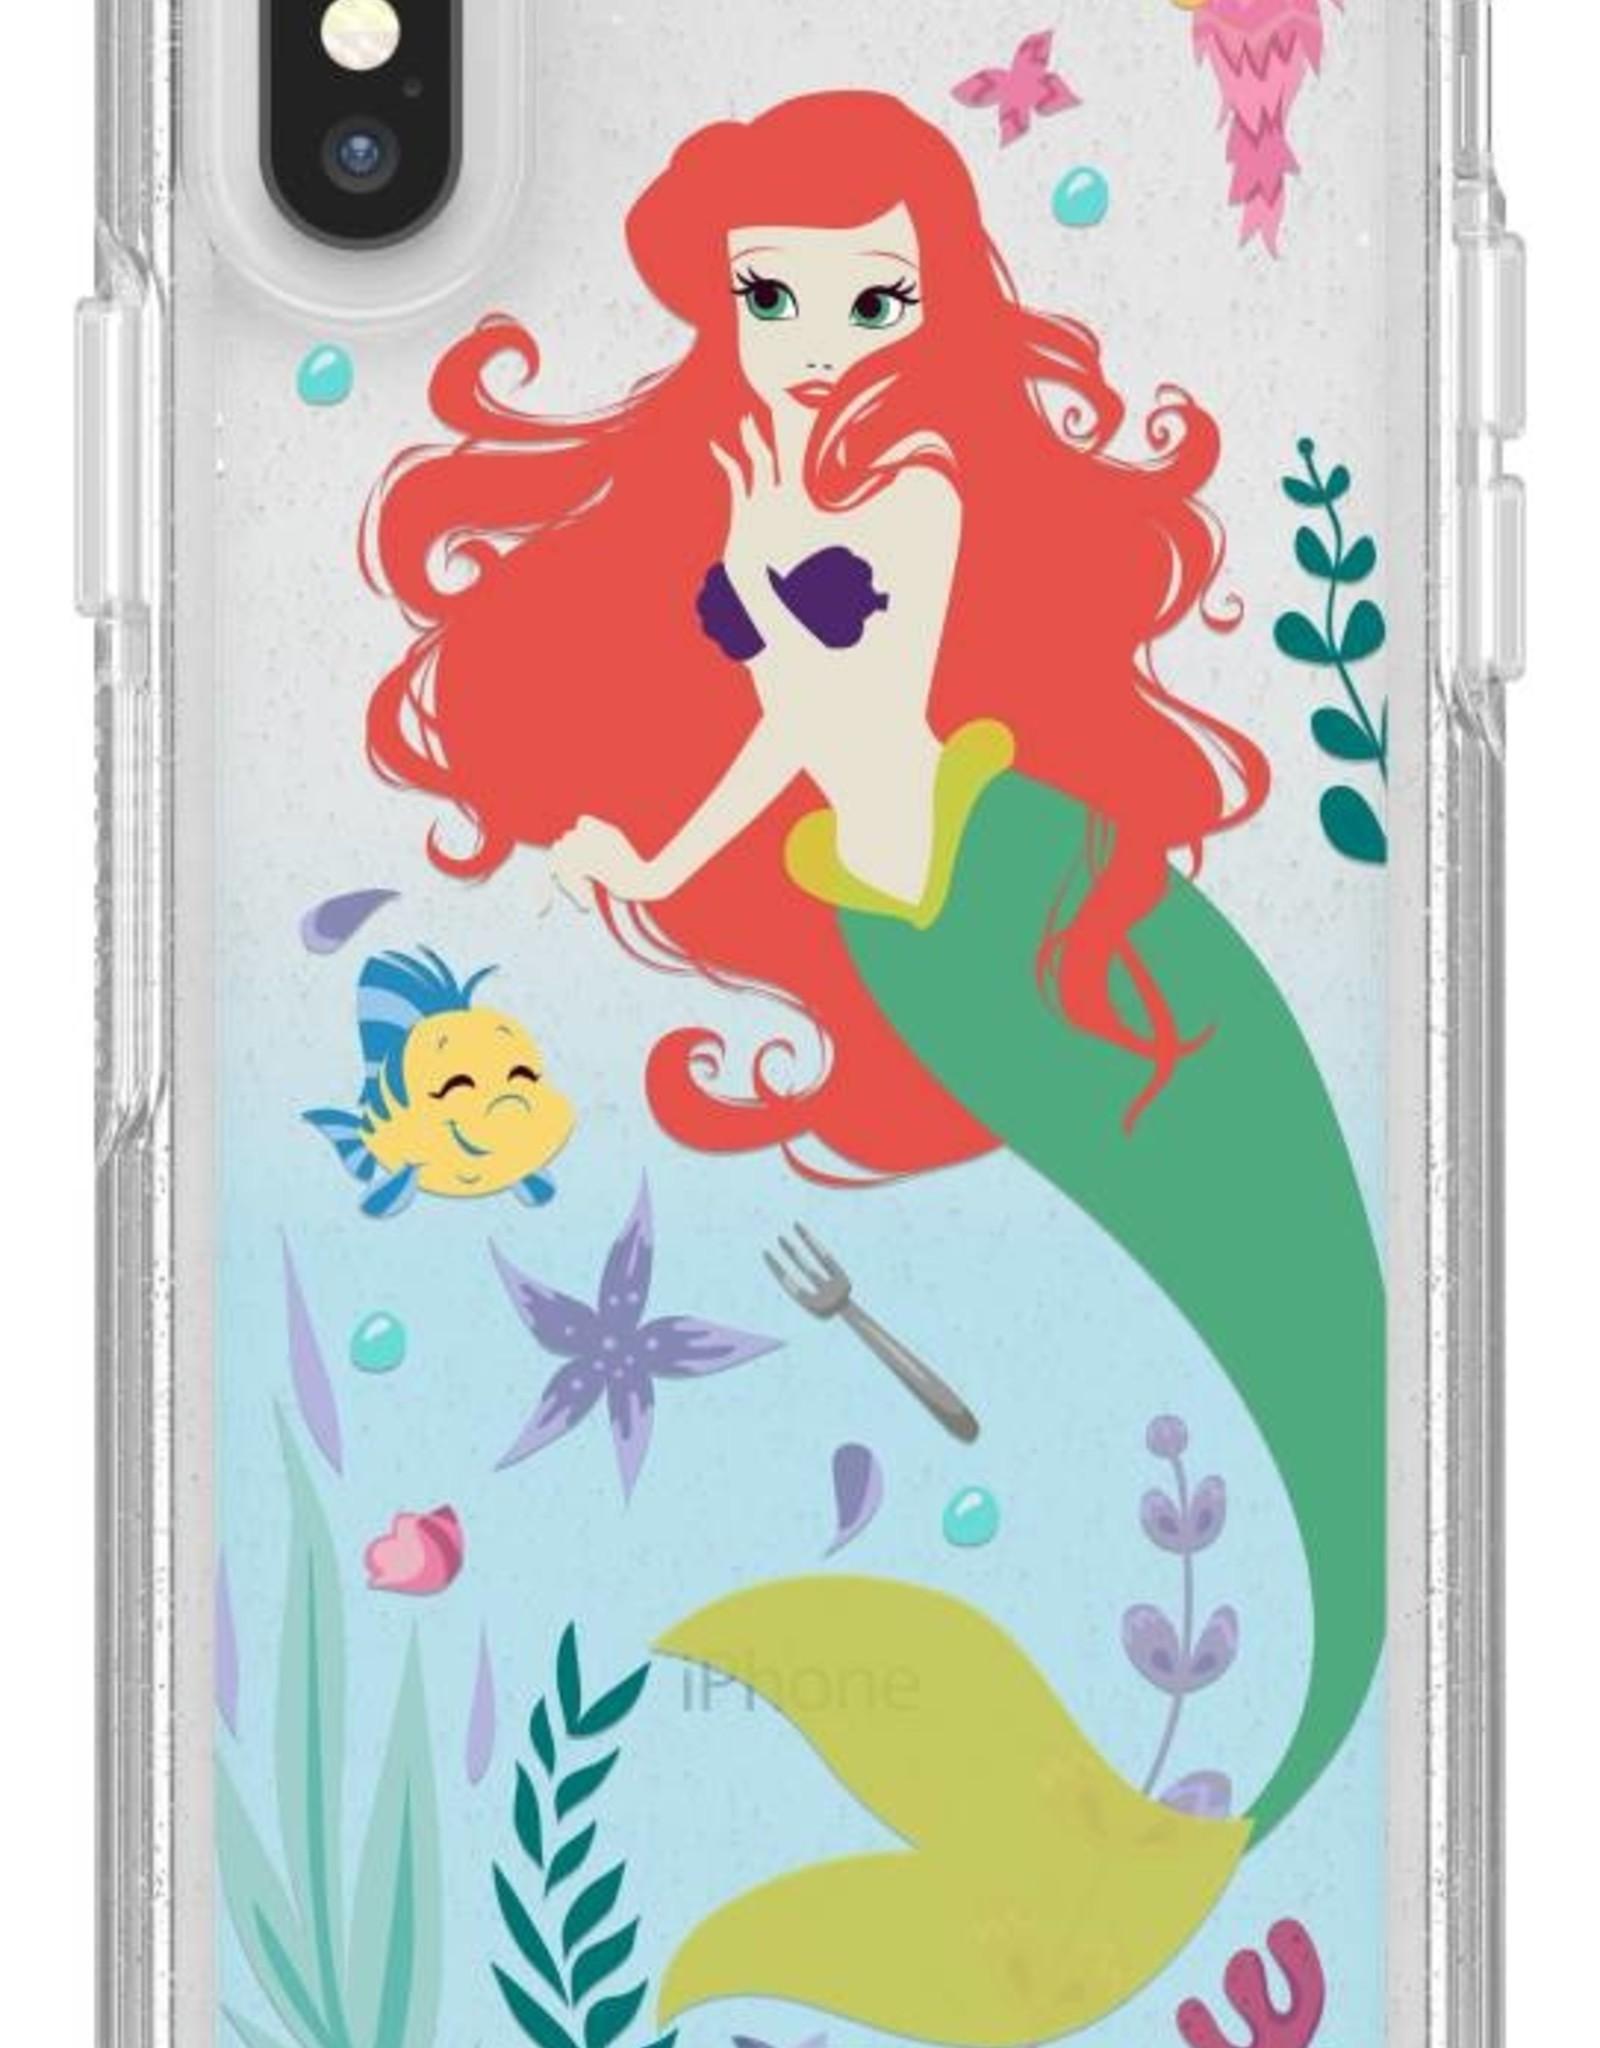 Otterbox OtterBox   iPhone X/Xs Ocean of Adventure (Ariel) Symmetry Disney Series Case   120-0463